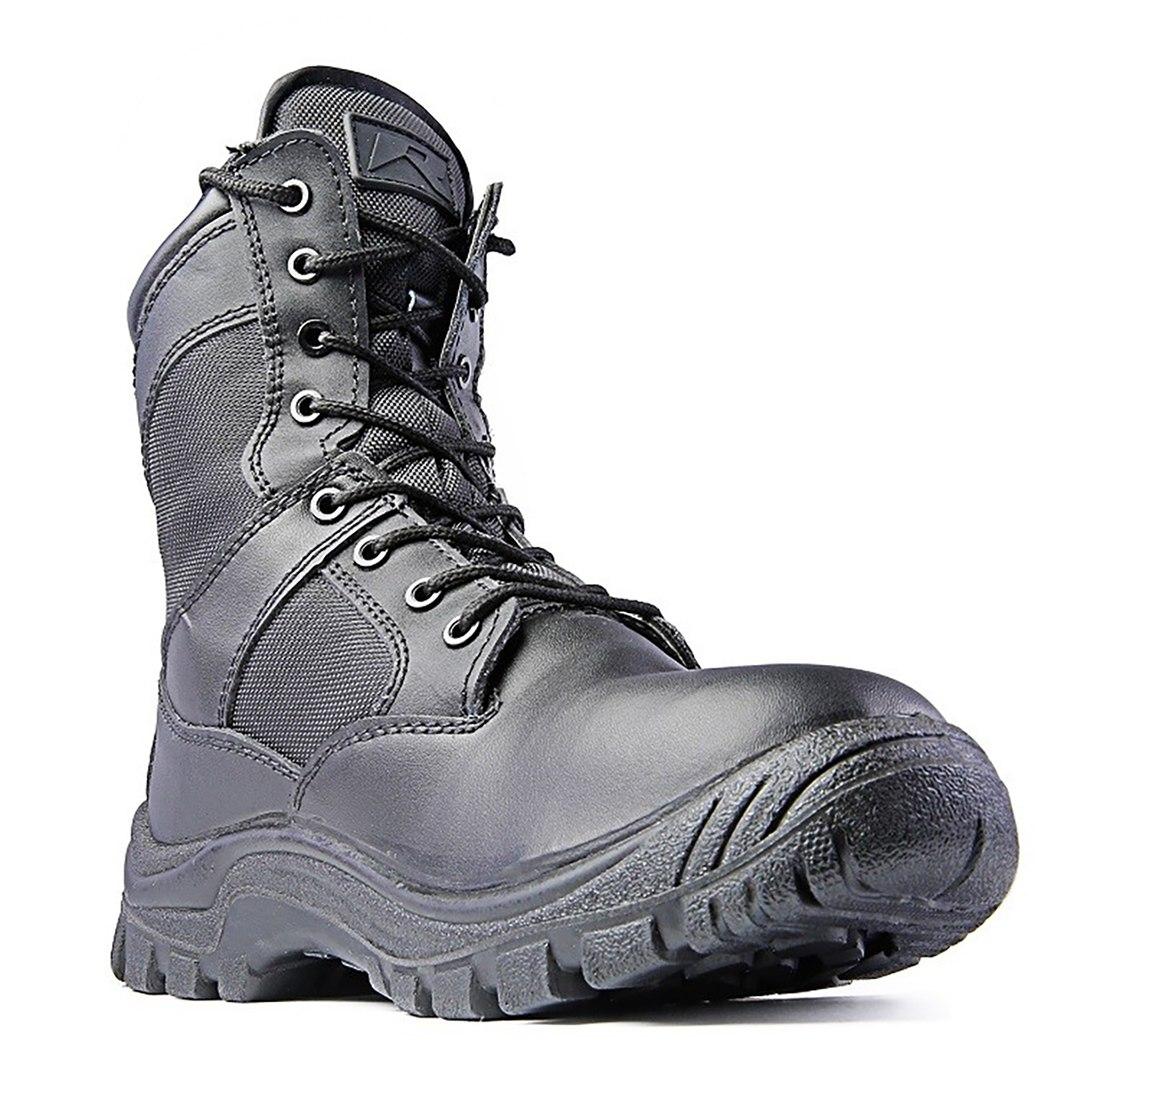 Ridge-Outdoors-Nighthawk-Black-Shoes-Multiple-Styles